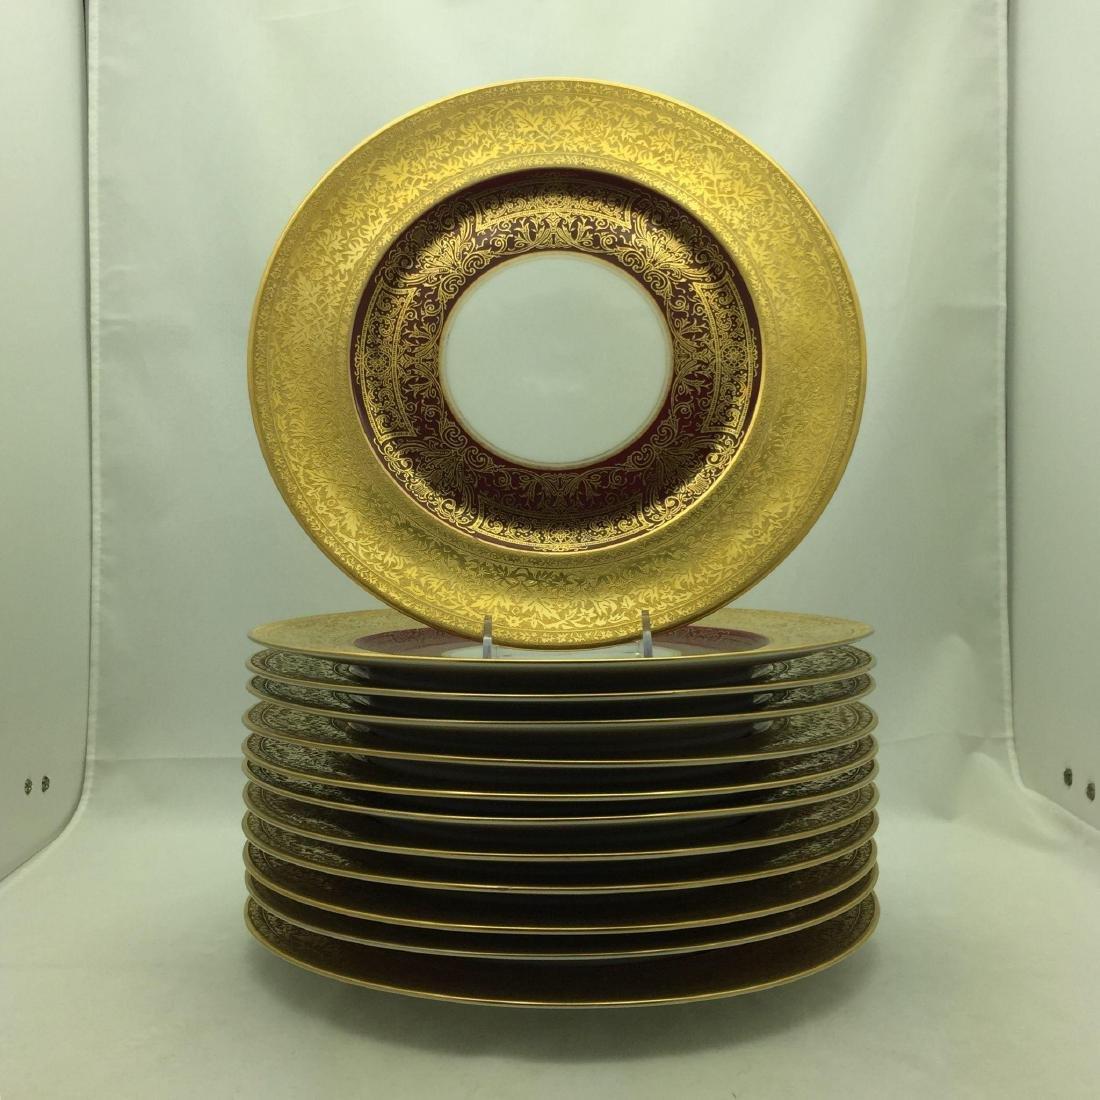 12 Heinrich Burgundy + Gold Large Service Plates